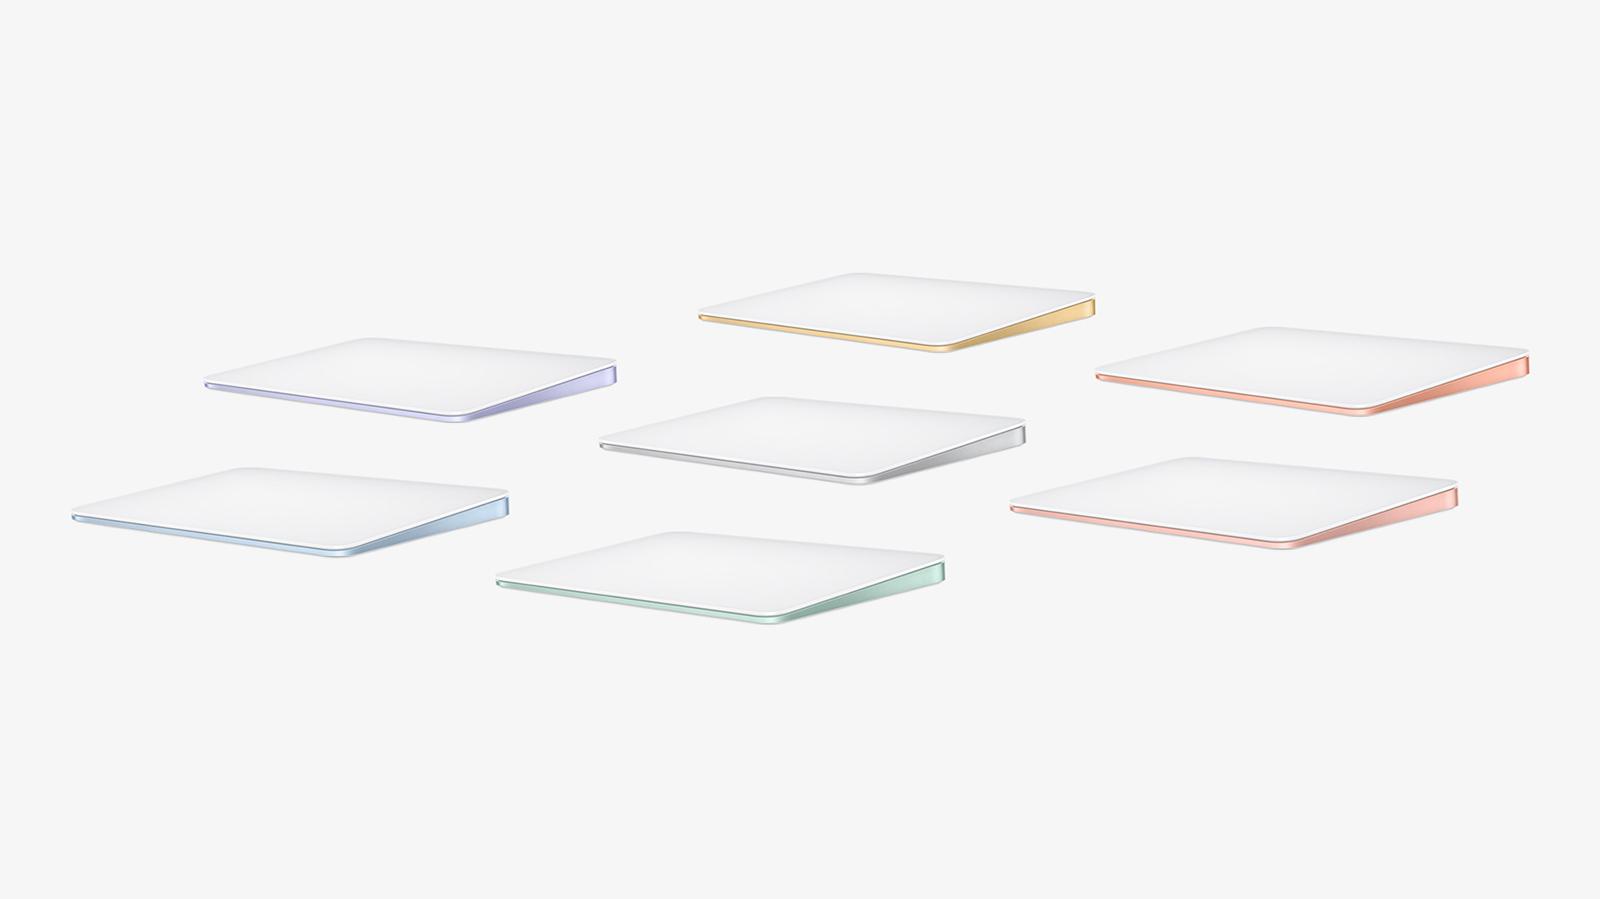 iMac 24 2021 accessories